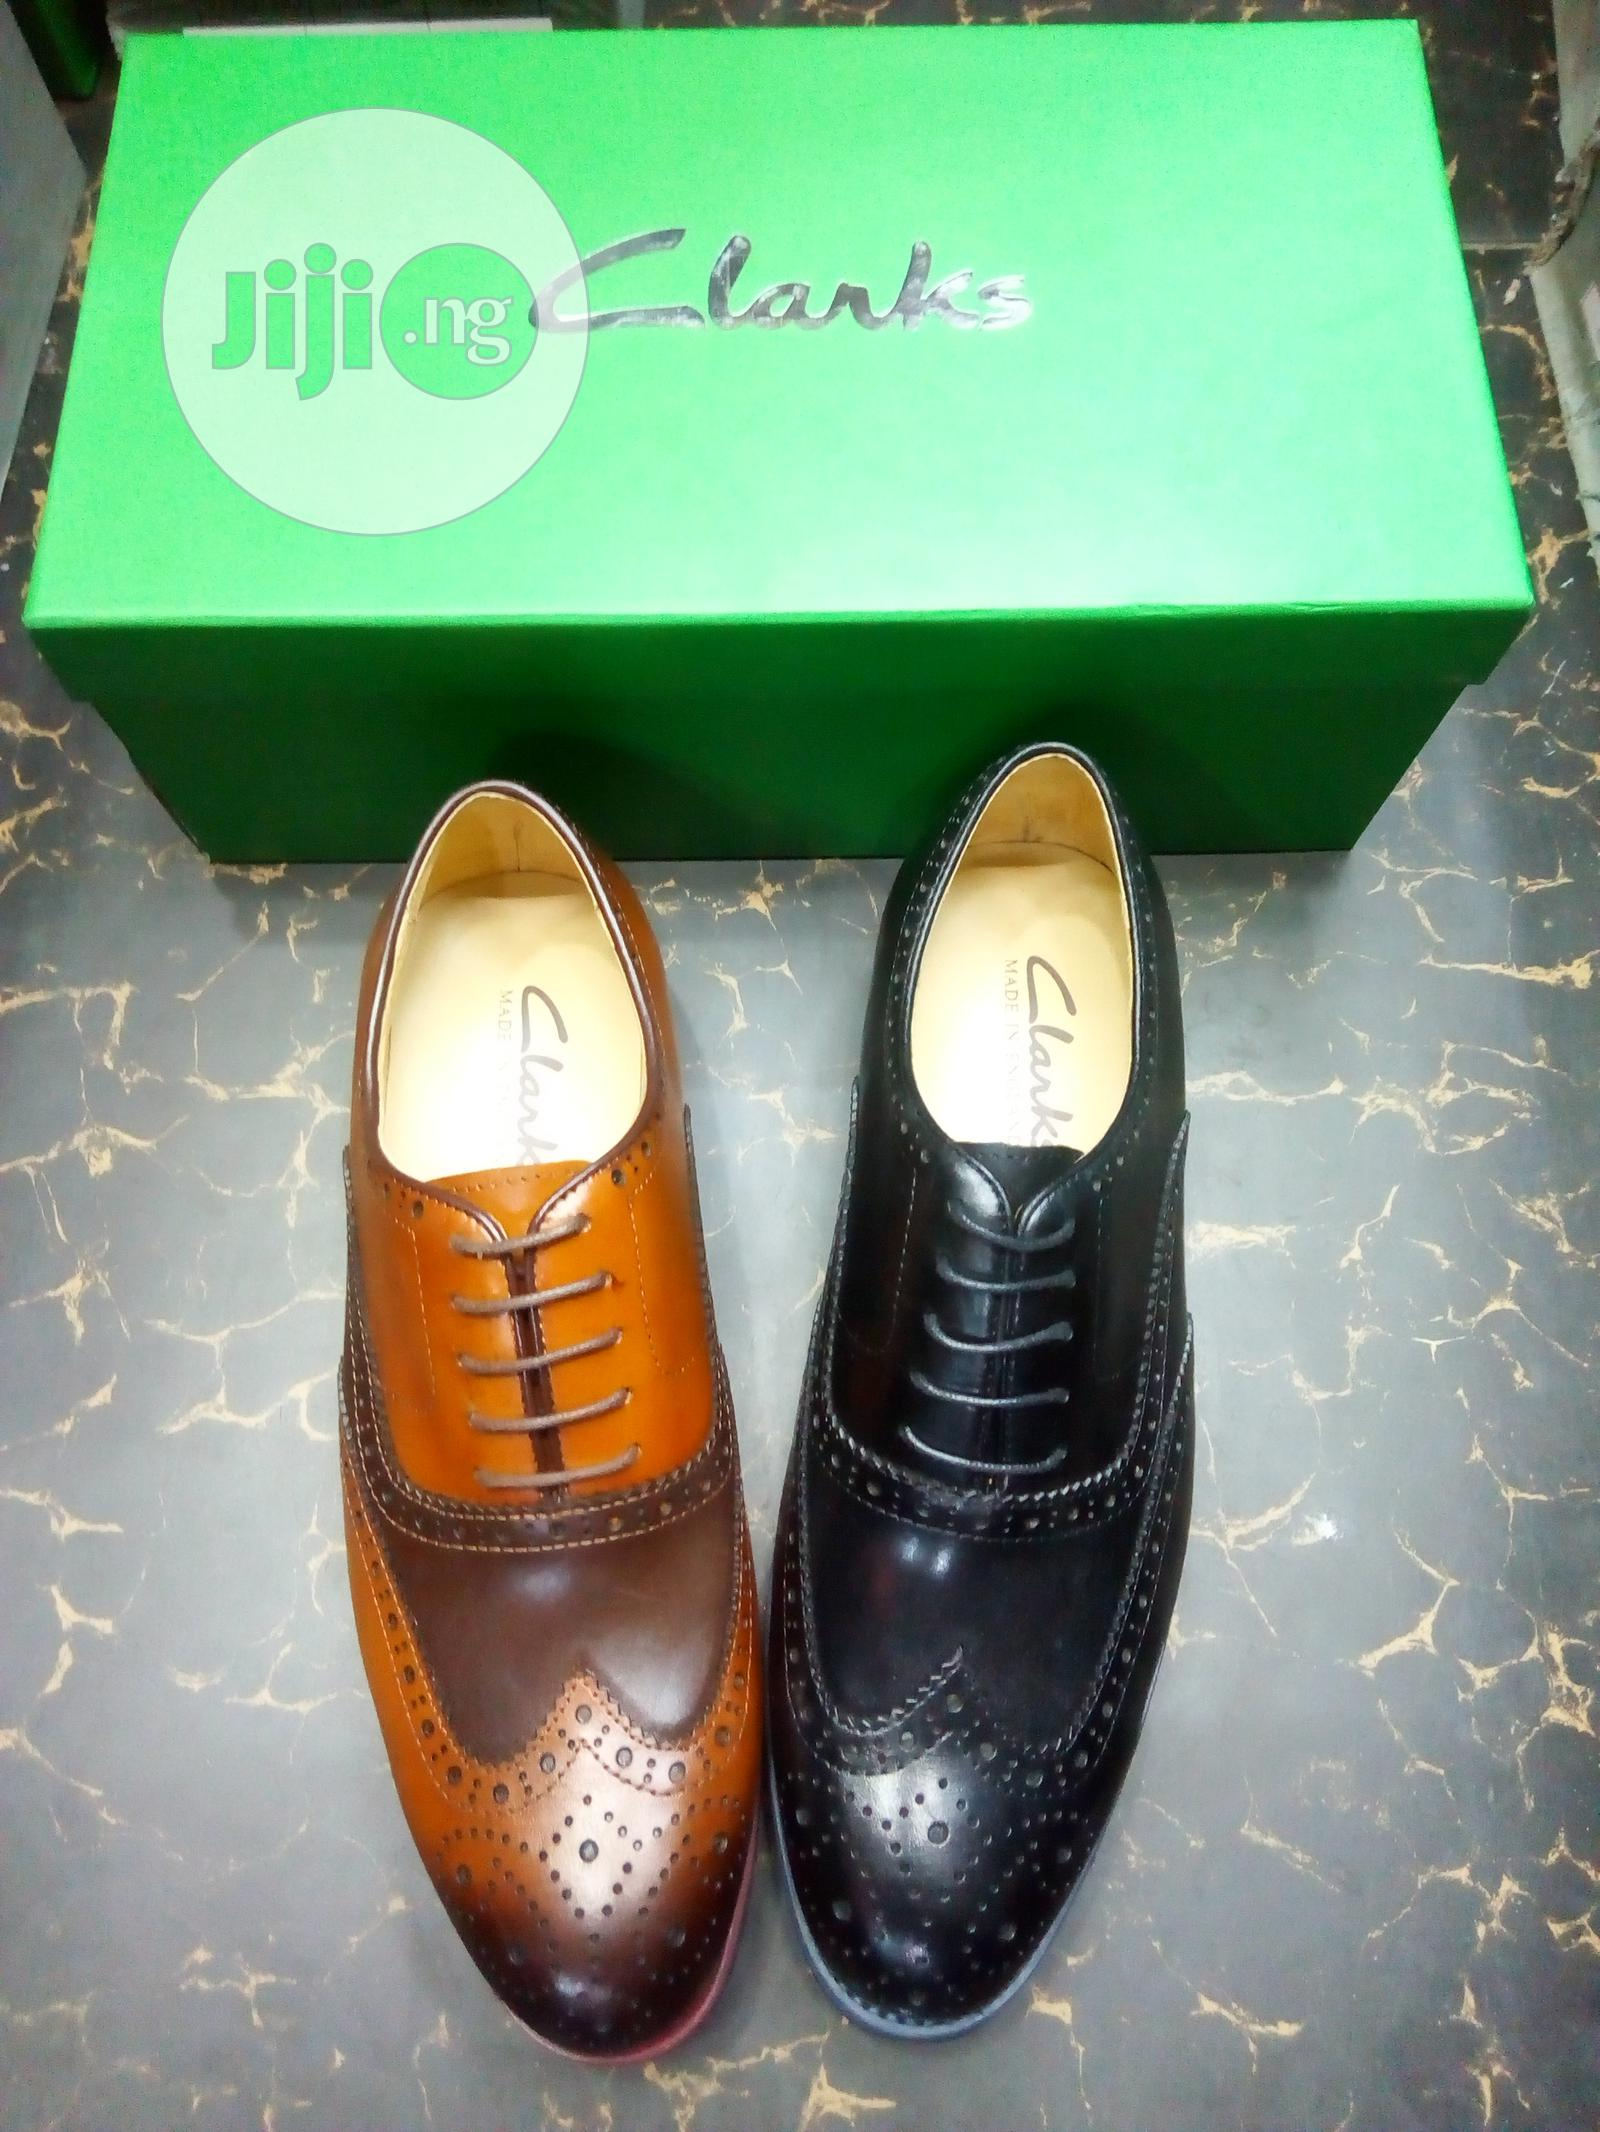 Clark's Men's Wedge Sole Brogues Shoes